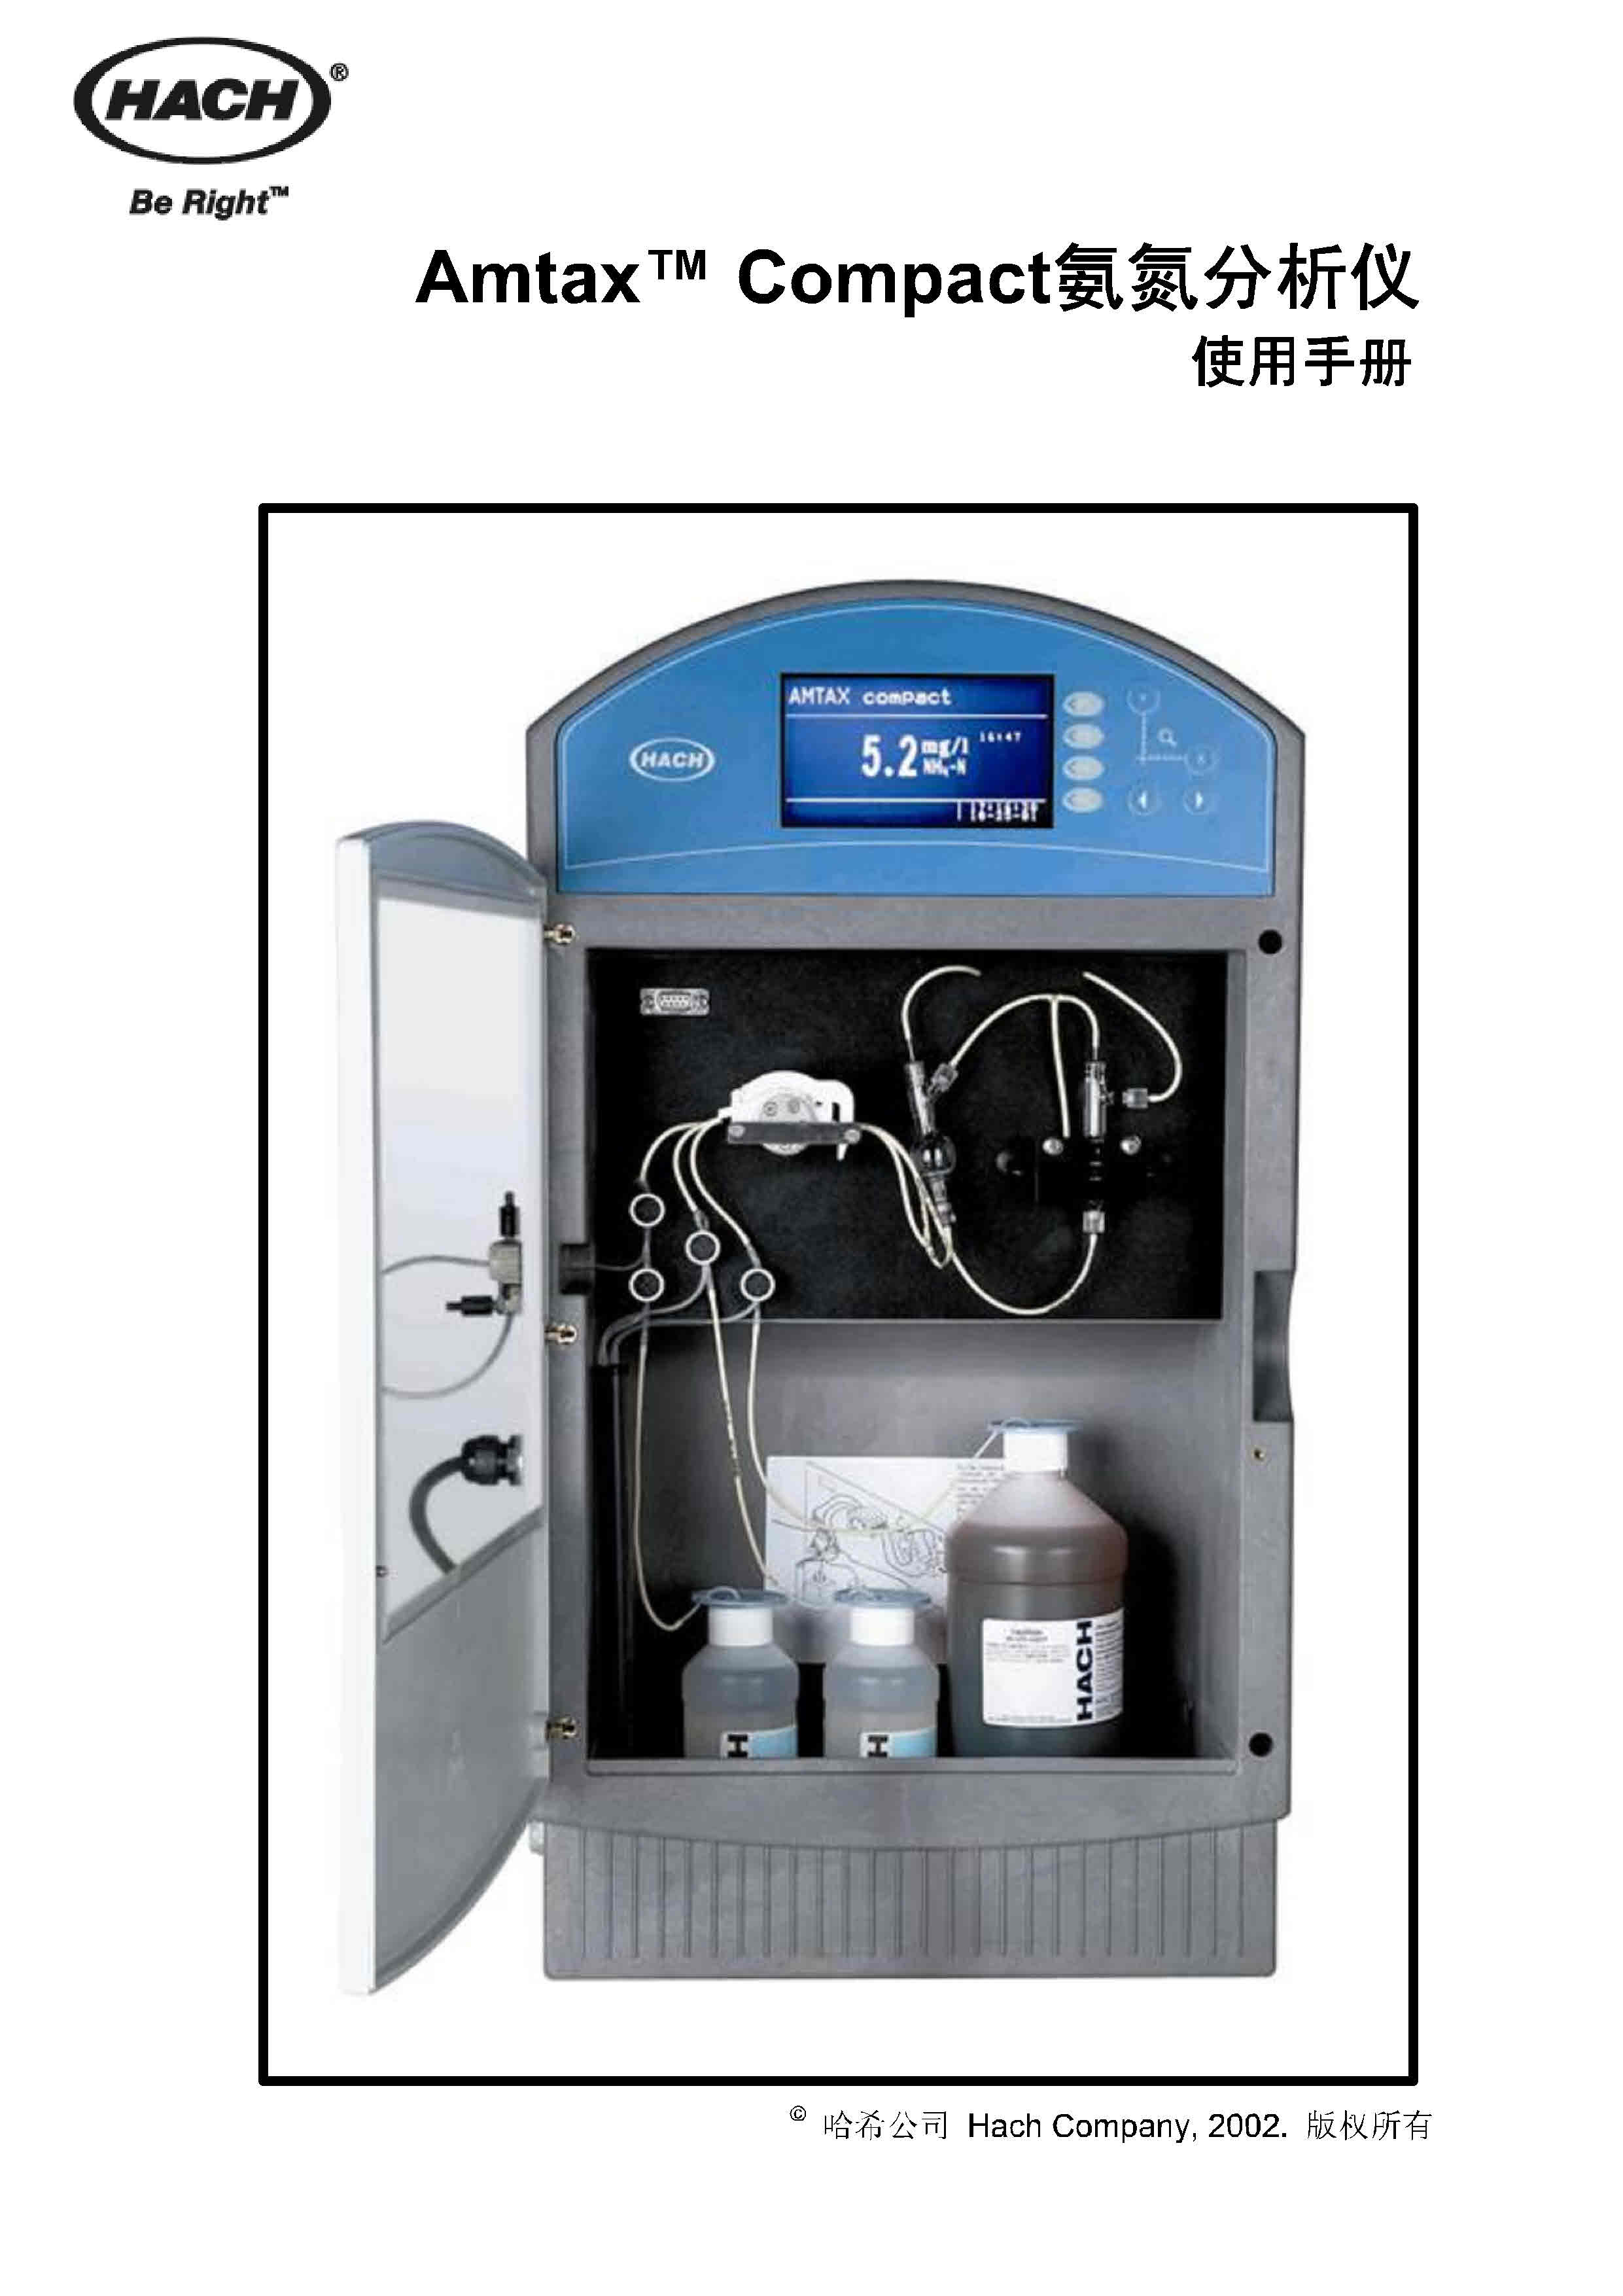 Amtax Compact 氨氮分析仪中文使用说明书